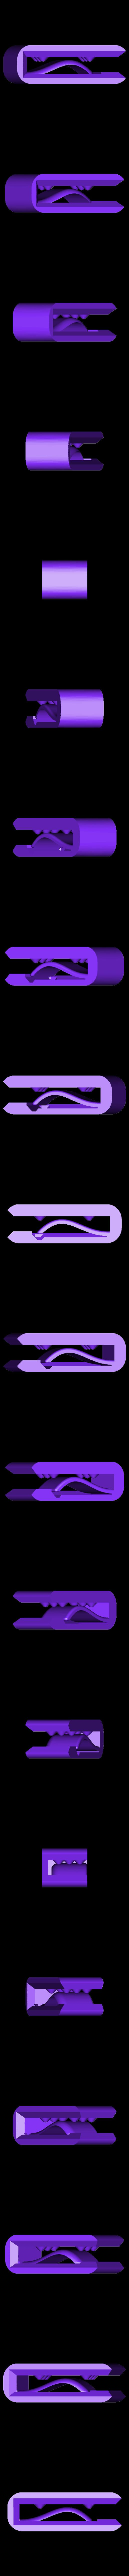 Towel_Basket_Bottom_Clip.stl Download free STL file The Next Towel • 3D printer template, AcE-Craft